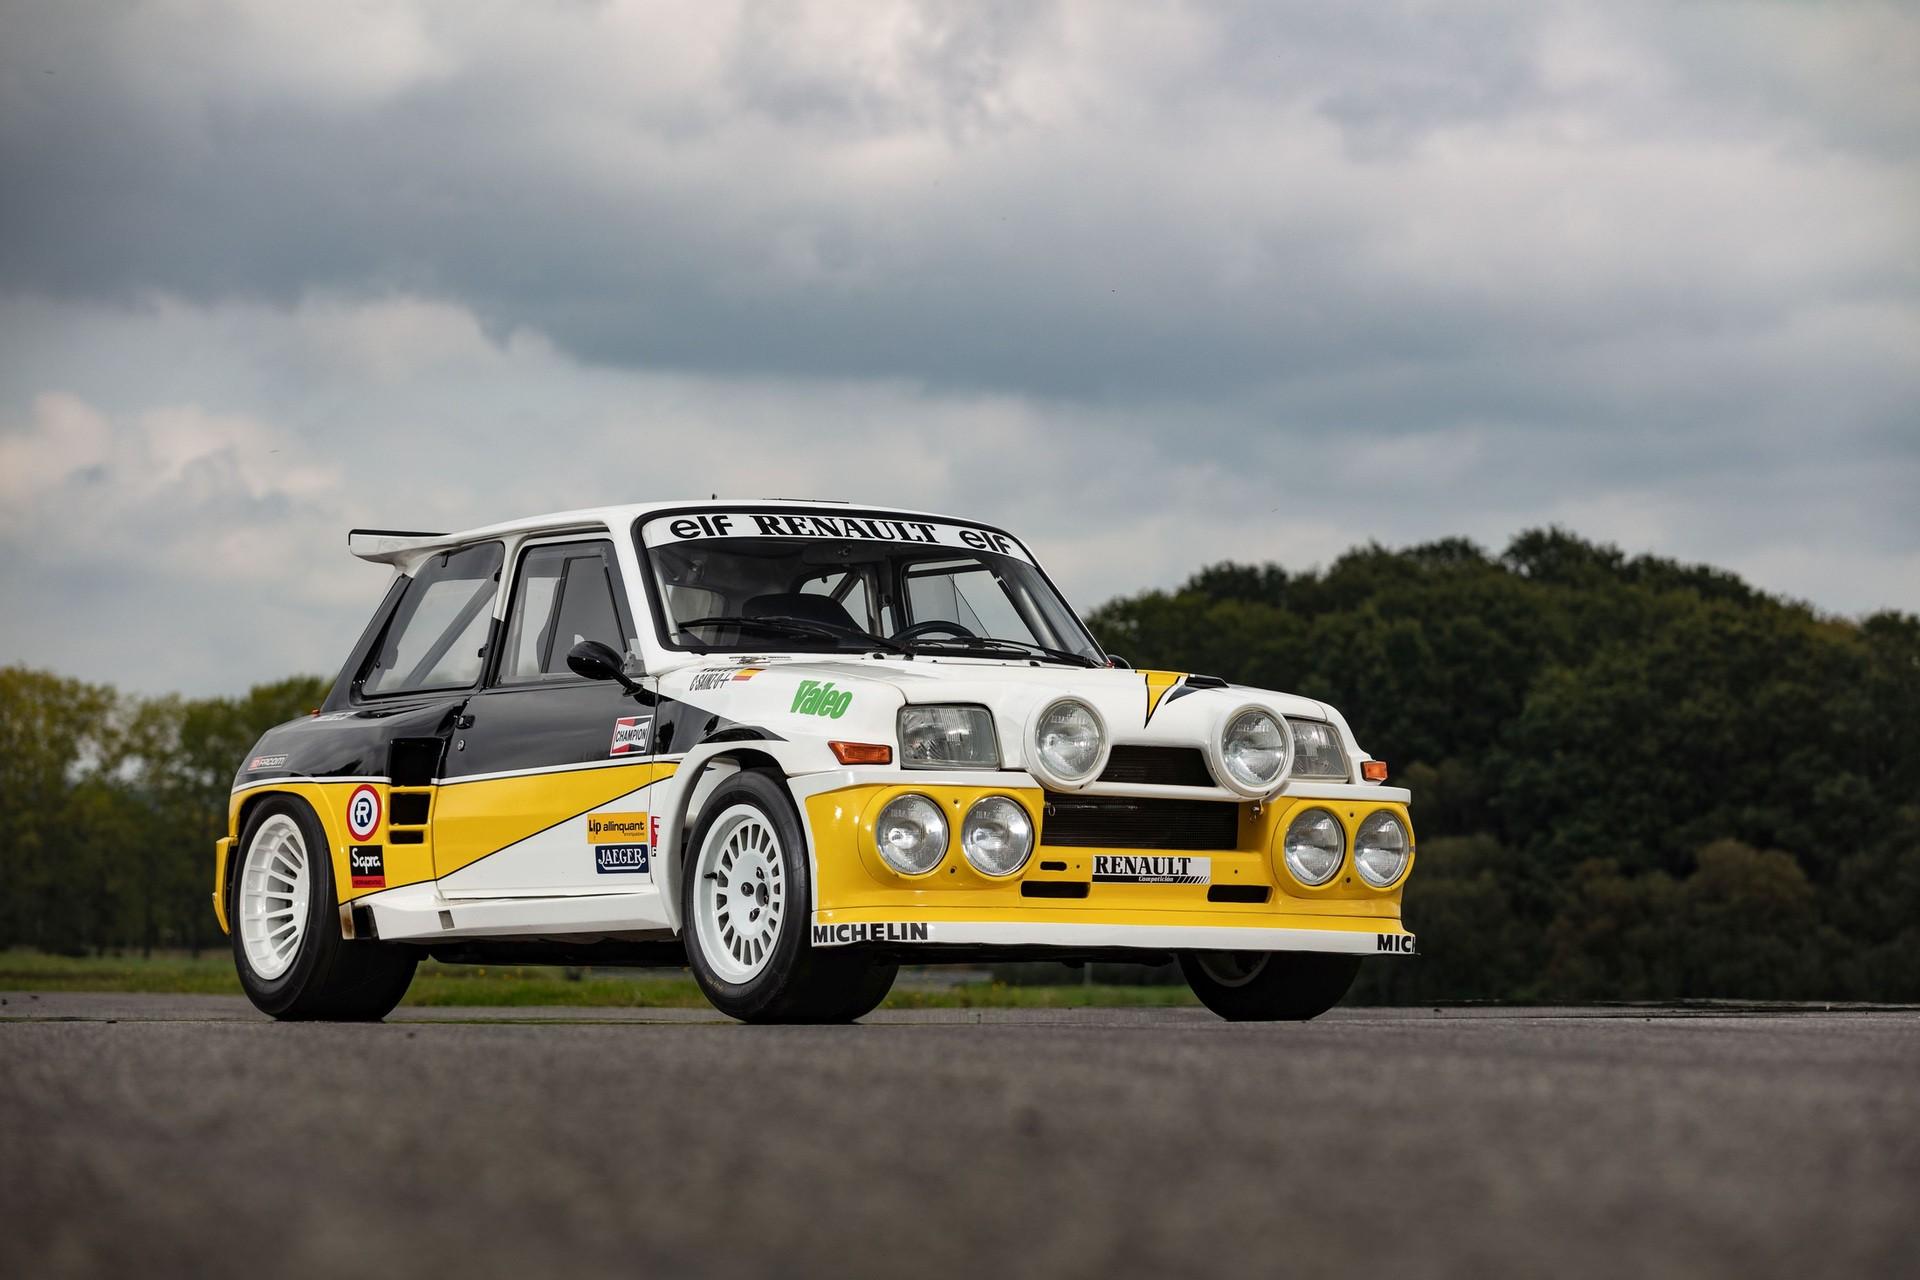 Renault_R5_Maxi_Turbo_ex-Carlos_Sainz-0005